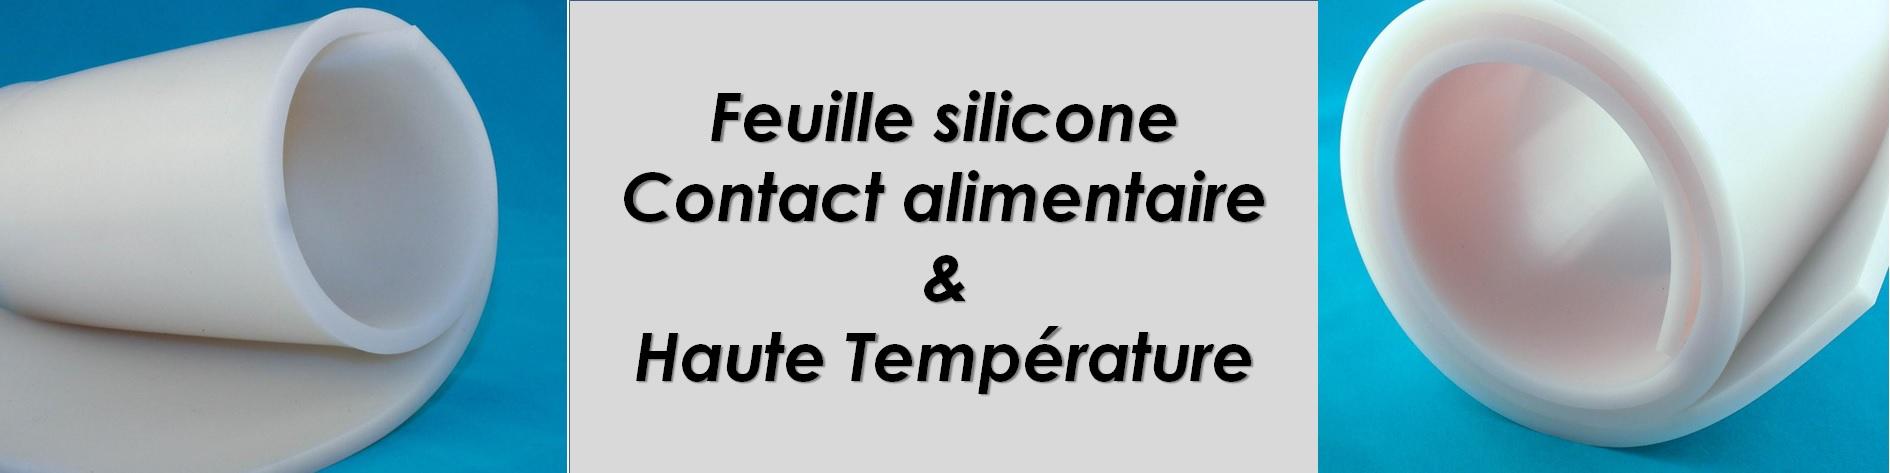 Feuille silicone haute température +230°C